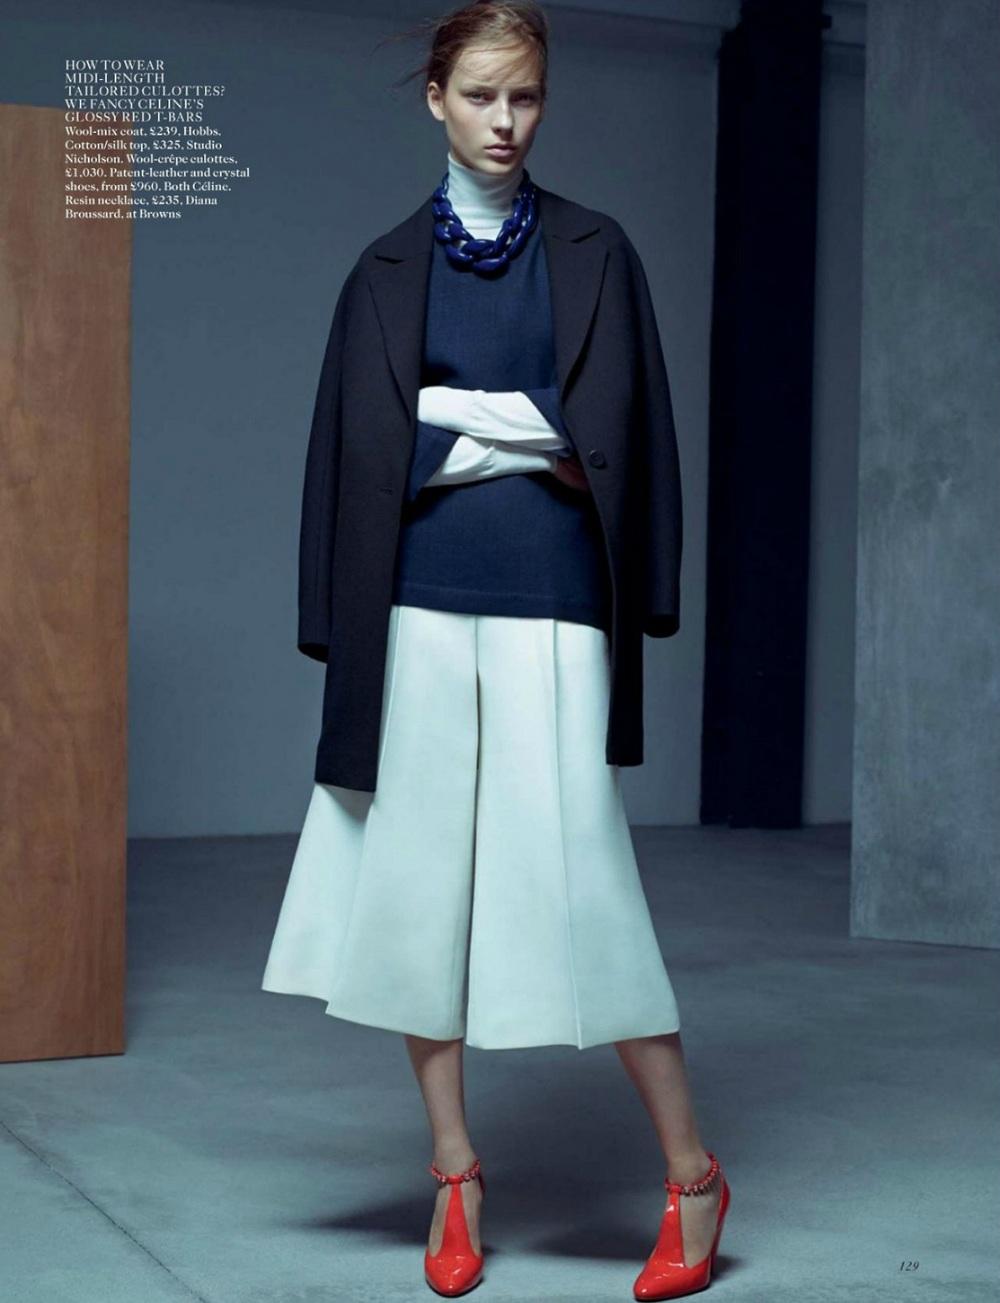 Karim-Sadli-Julia-Bergshoeff-Vogue-UK-January-2015-2.jpg